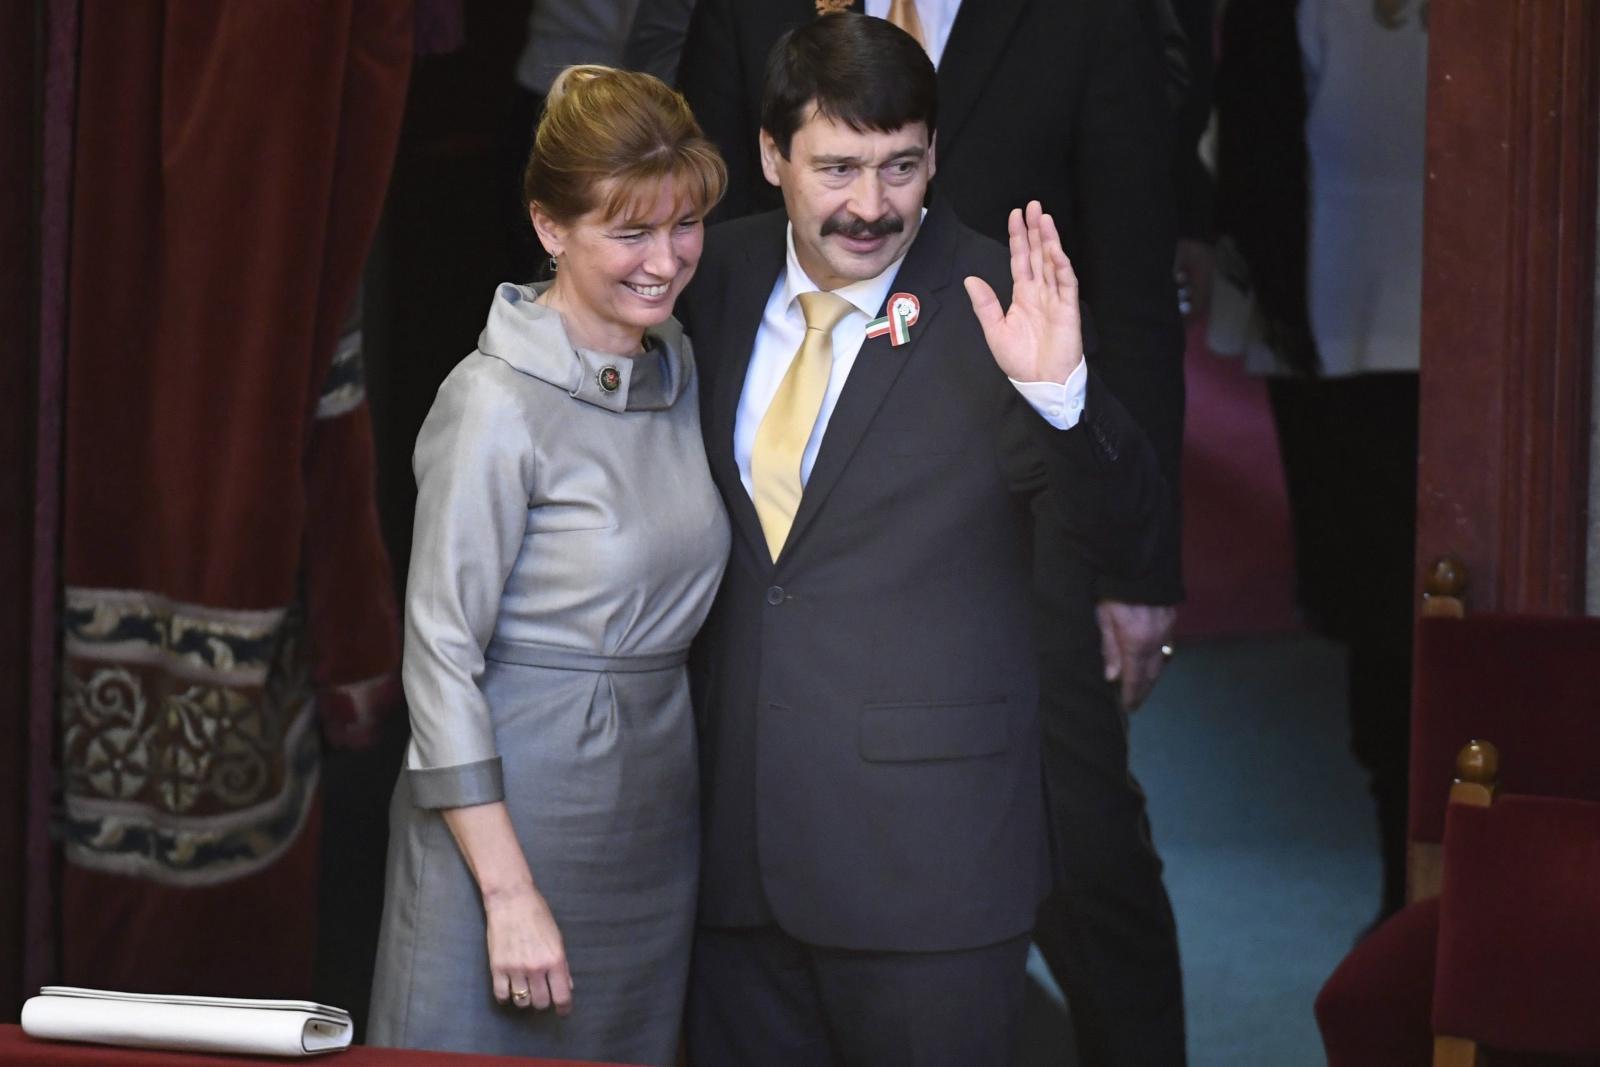 Na prezydenta Węgier ponownie wybrano Janosa Adera. Fot. PAP/EPA/SZILARD KOSZTICSAK